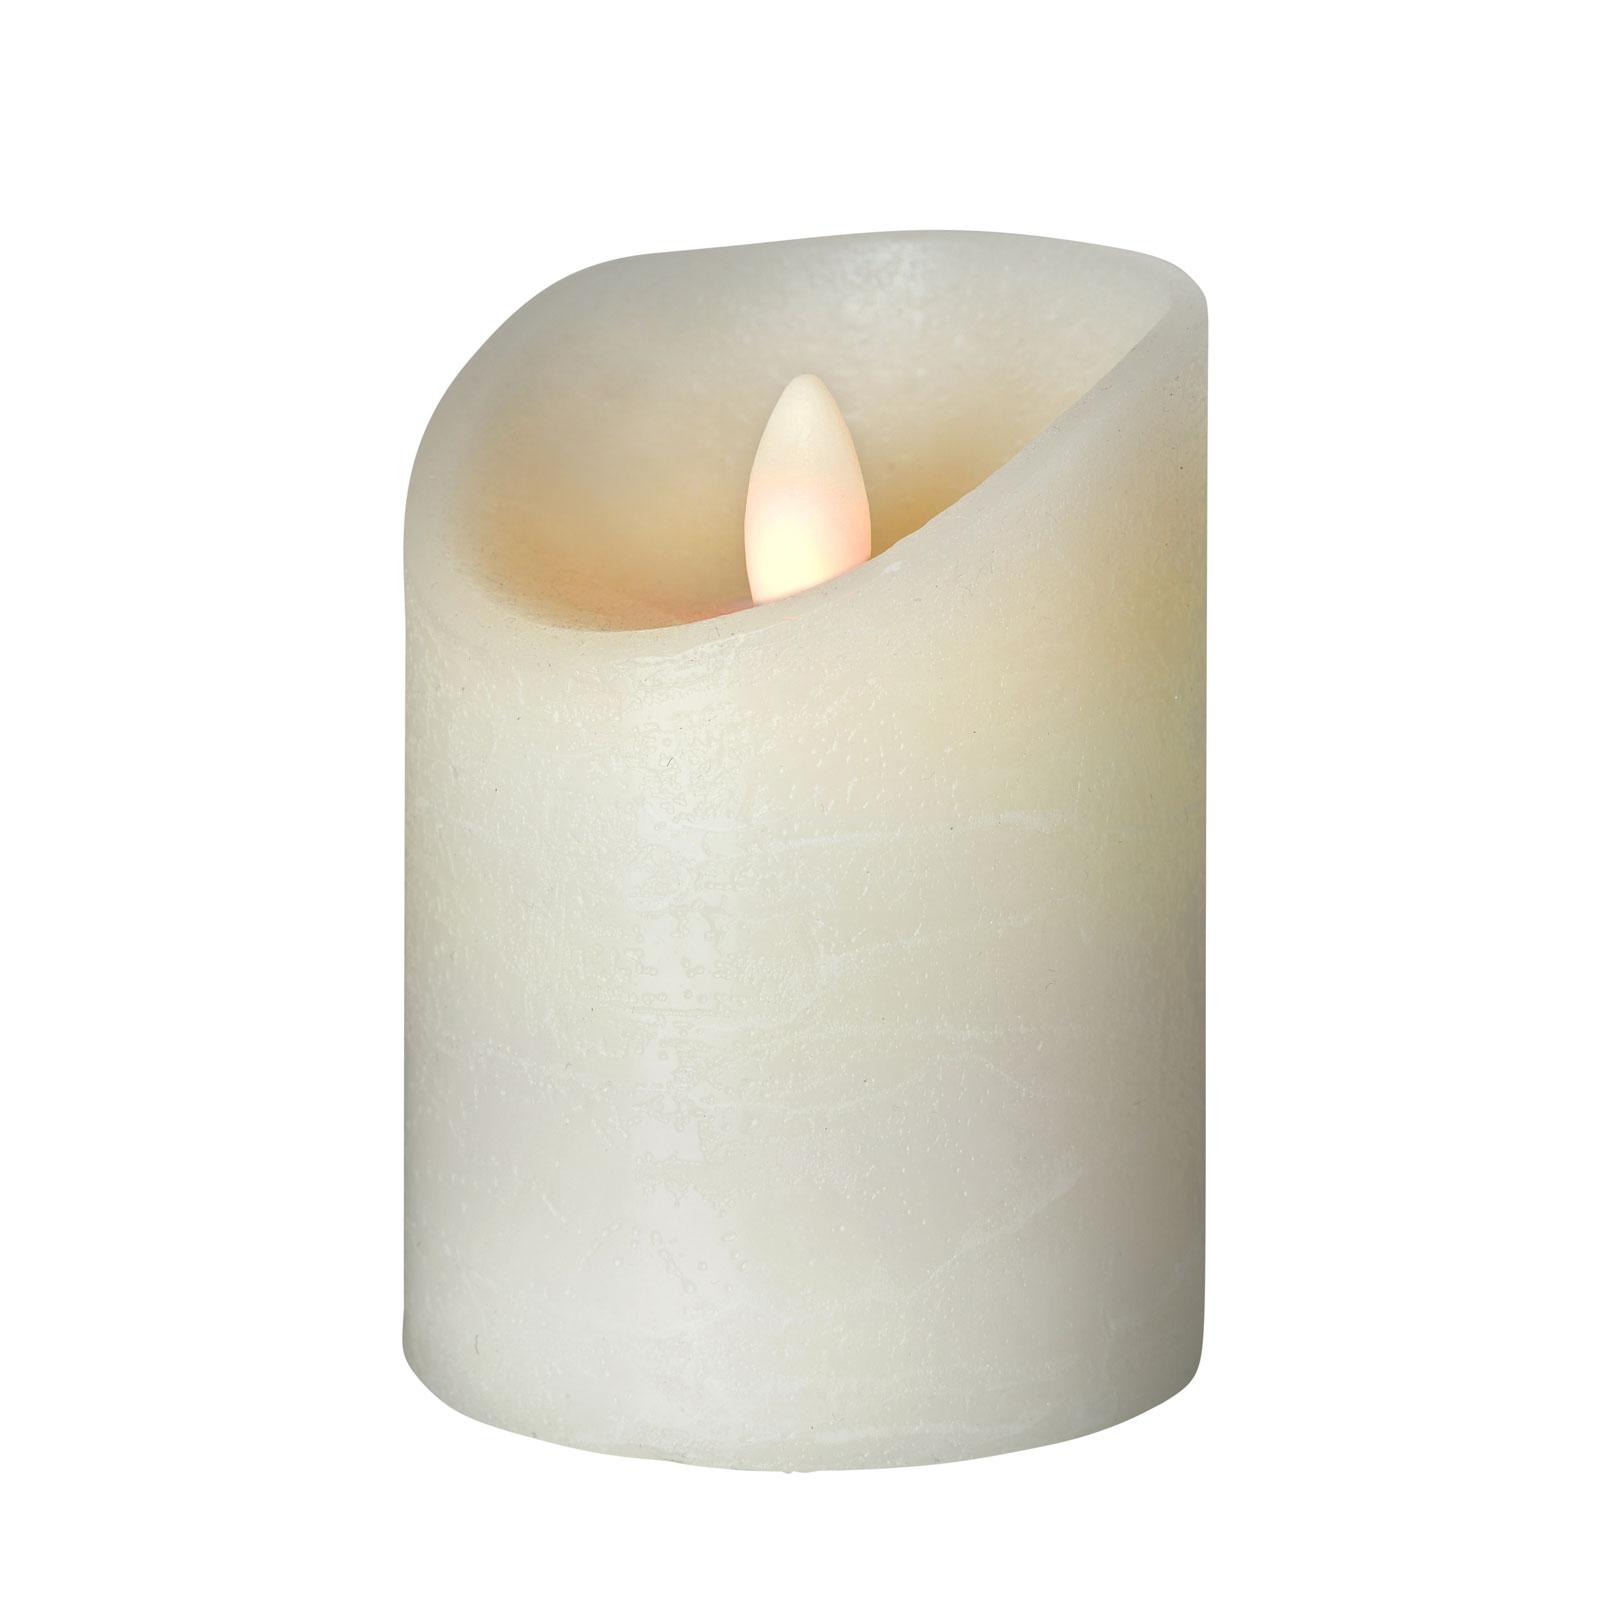 LED-Kerze Shine, Ø 7,5 cm, elfenbein, Höhe 10 cm